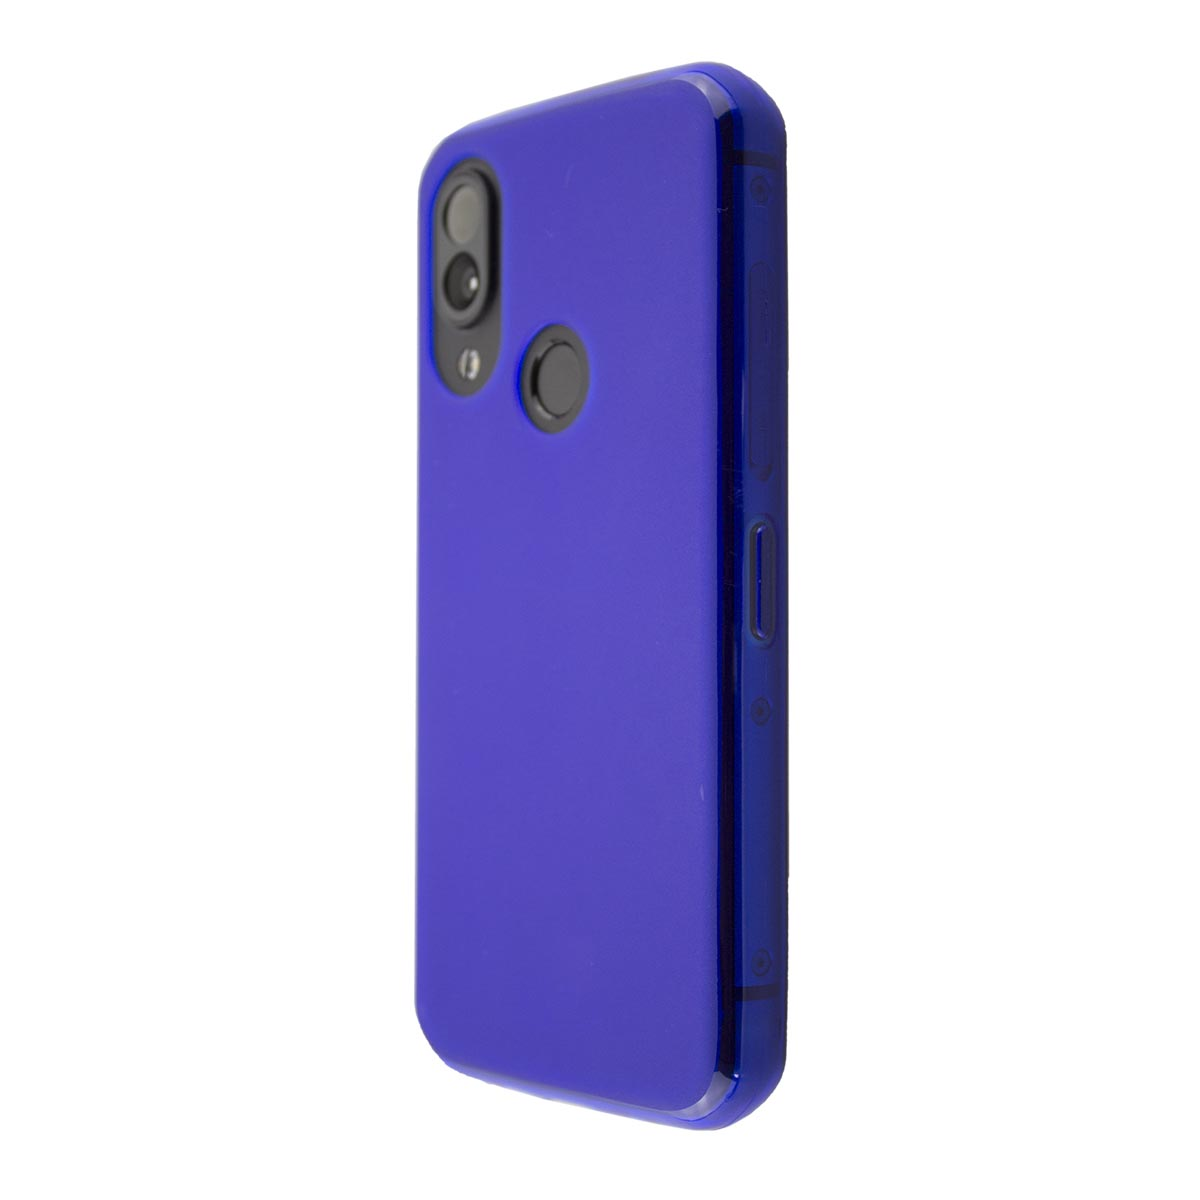 Caseroxx-TPU-Case-pour-Cat-S62-Pro-fait-de-TPU miniature 11